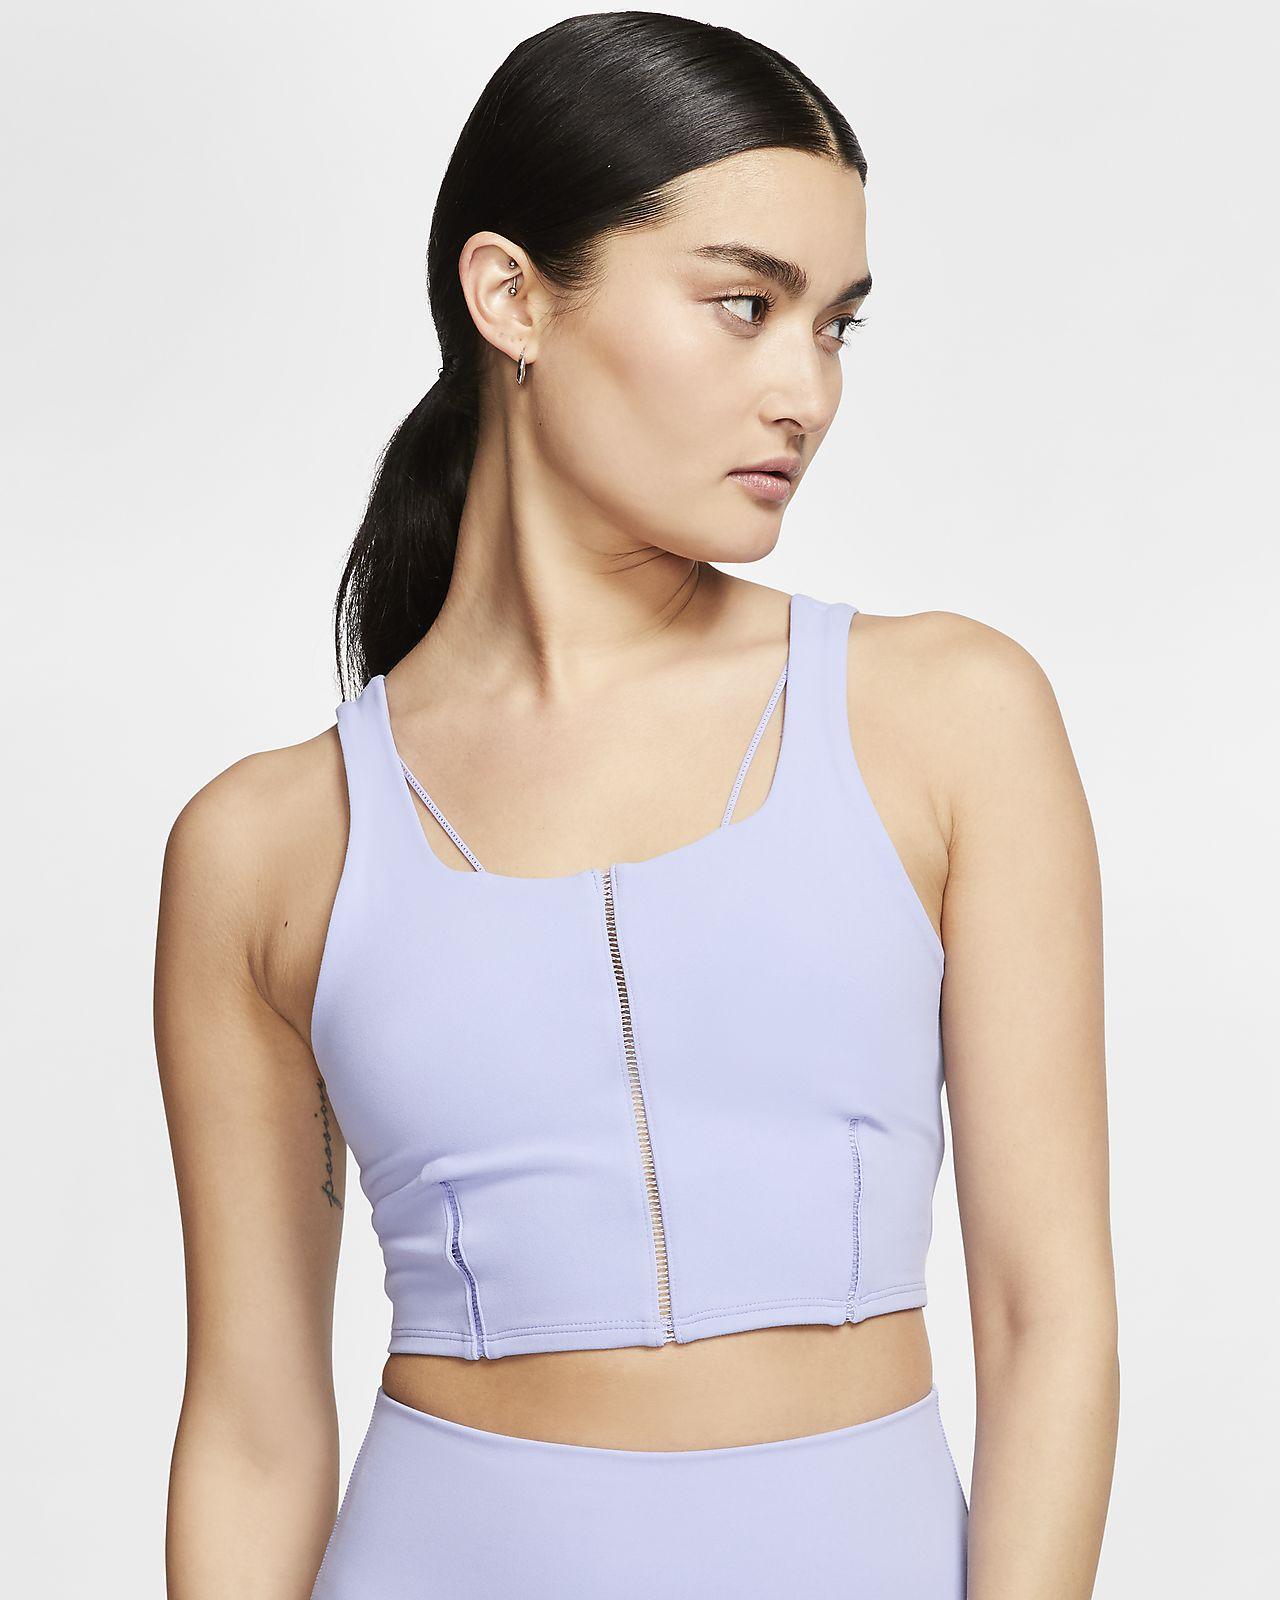 Camisola sem mangas recortada em Infinalon Nike Yoga Luxe para mulher